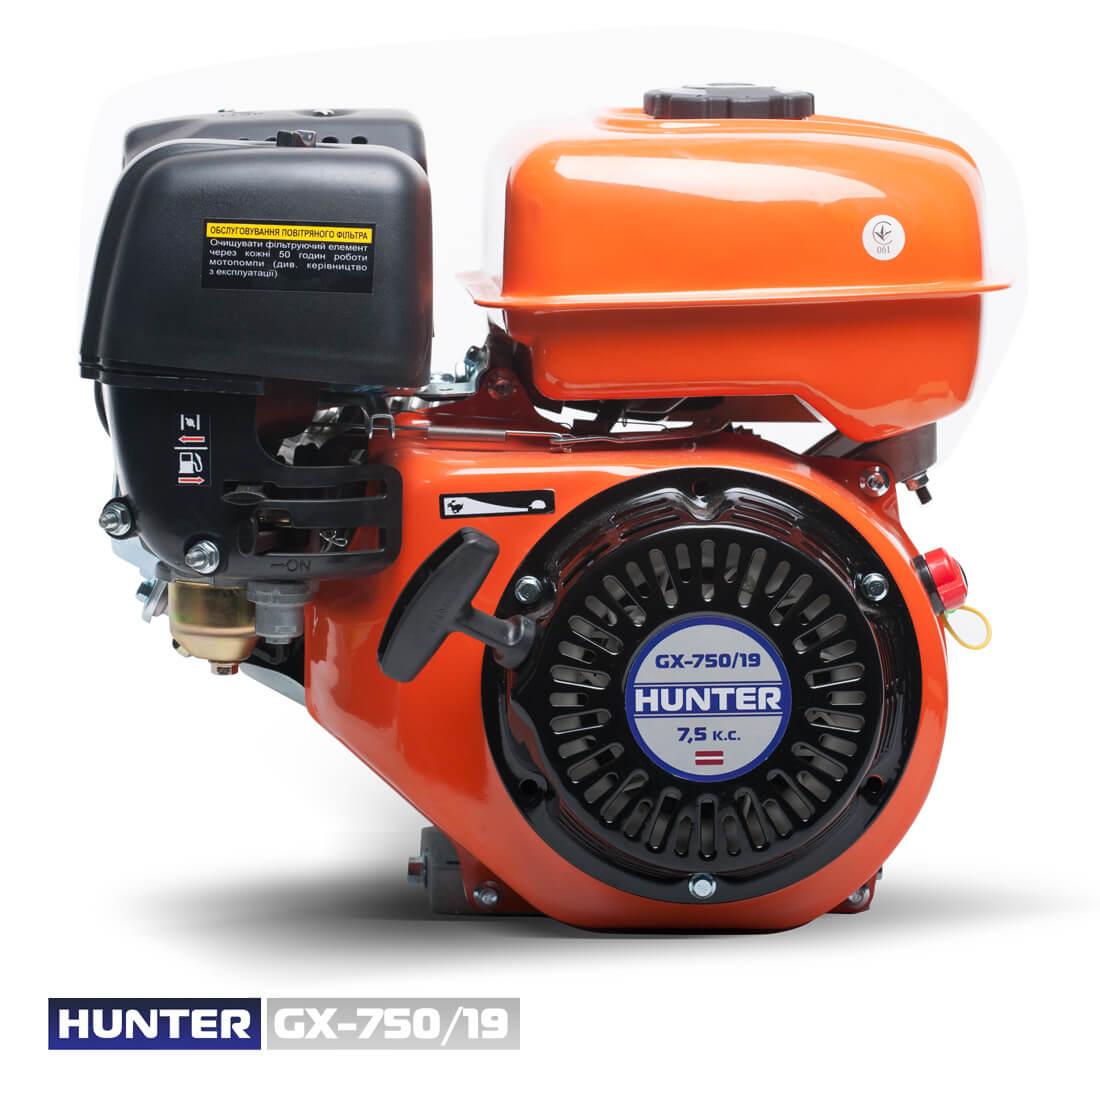 Фото GX-750/19 цена 4250грн №2 — Hunter